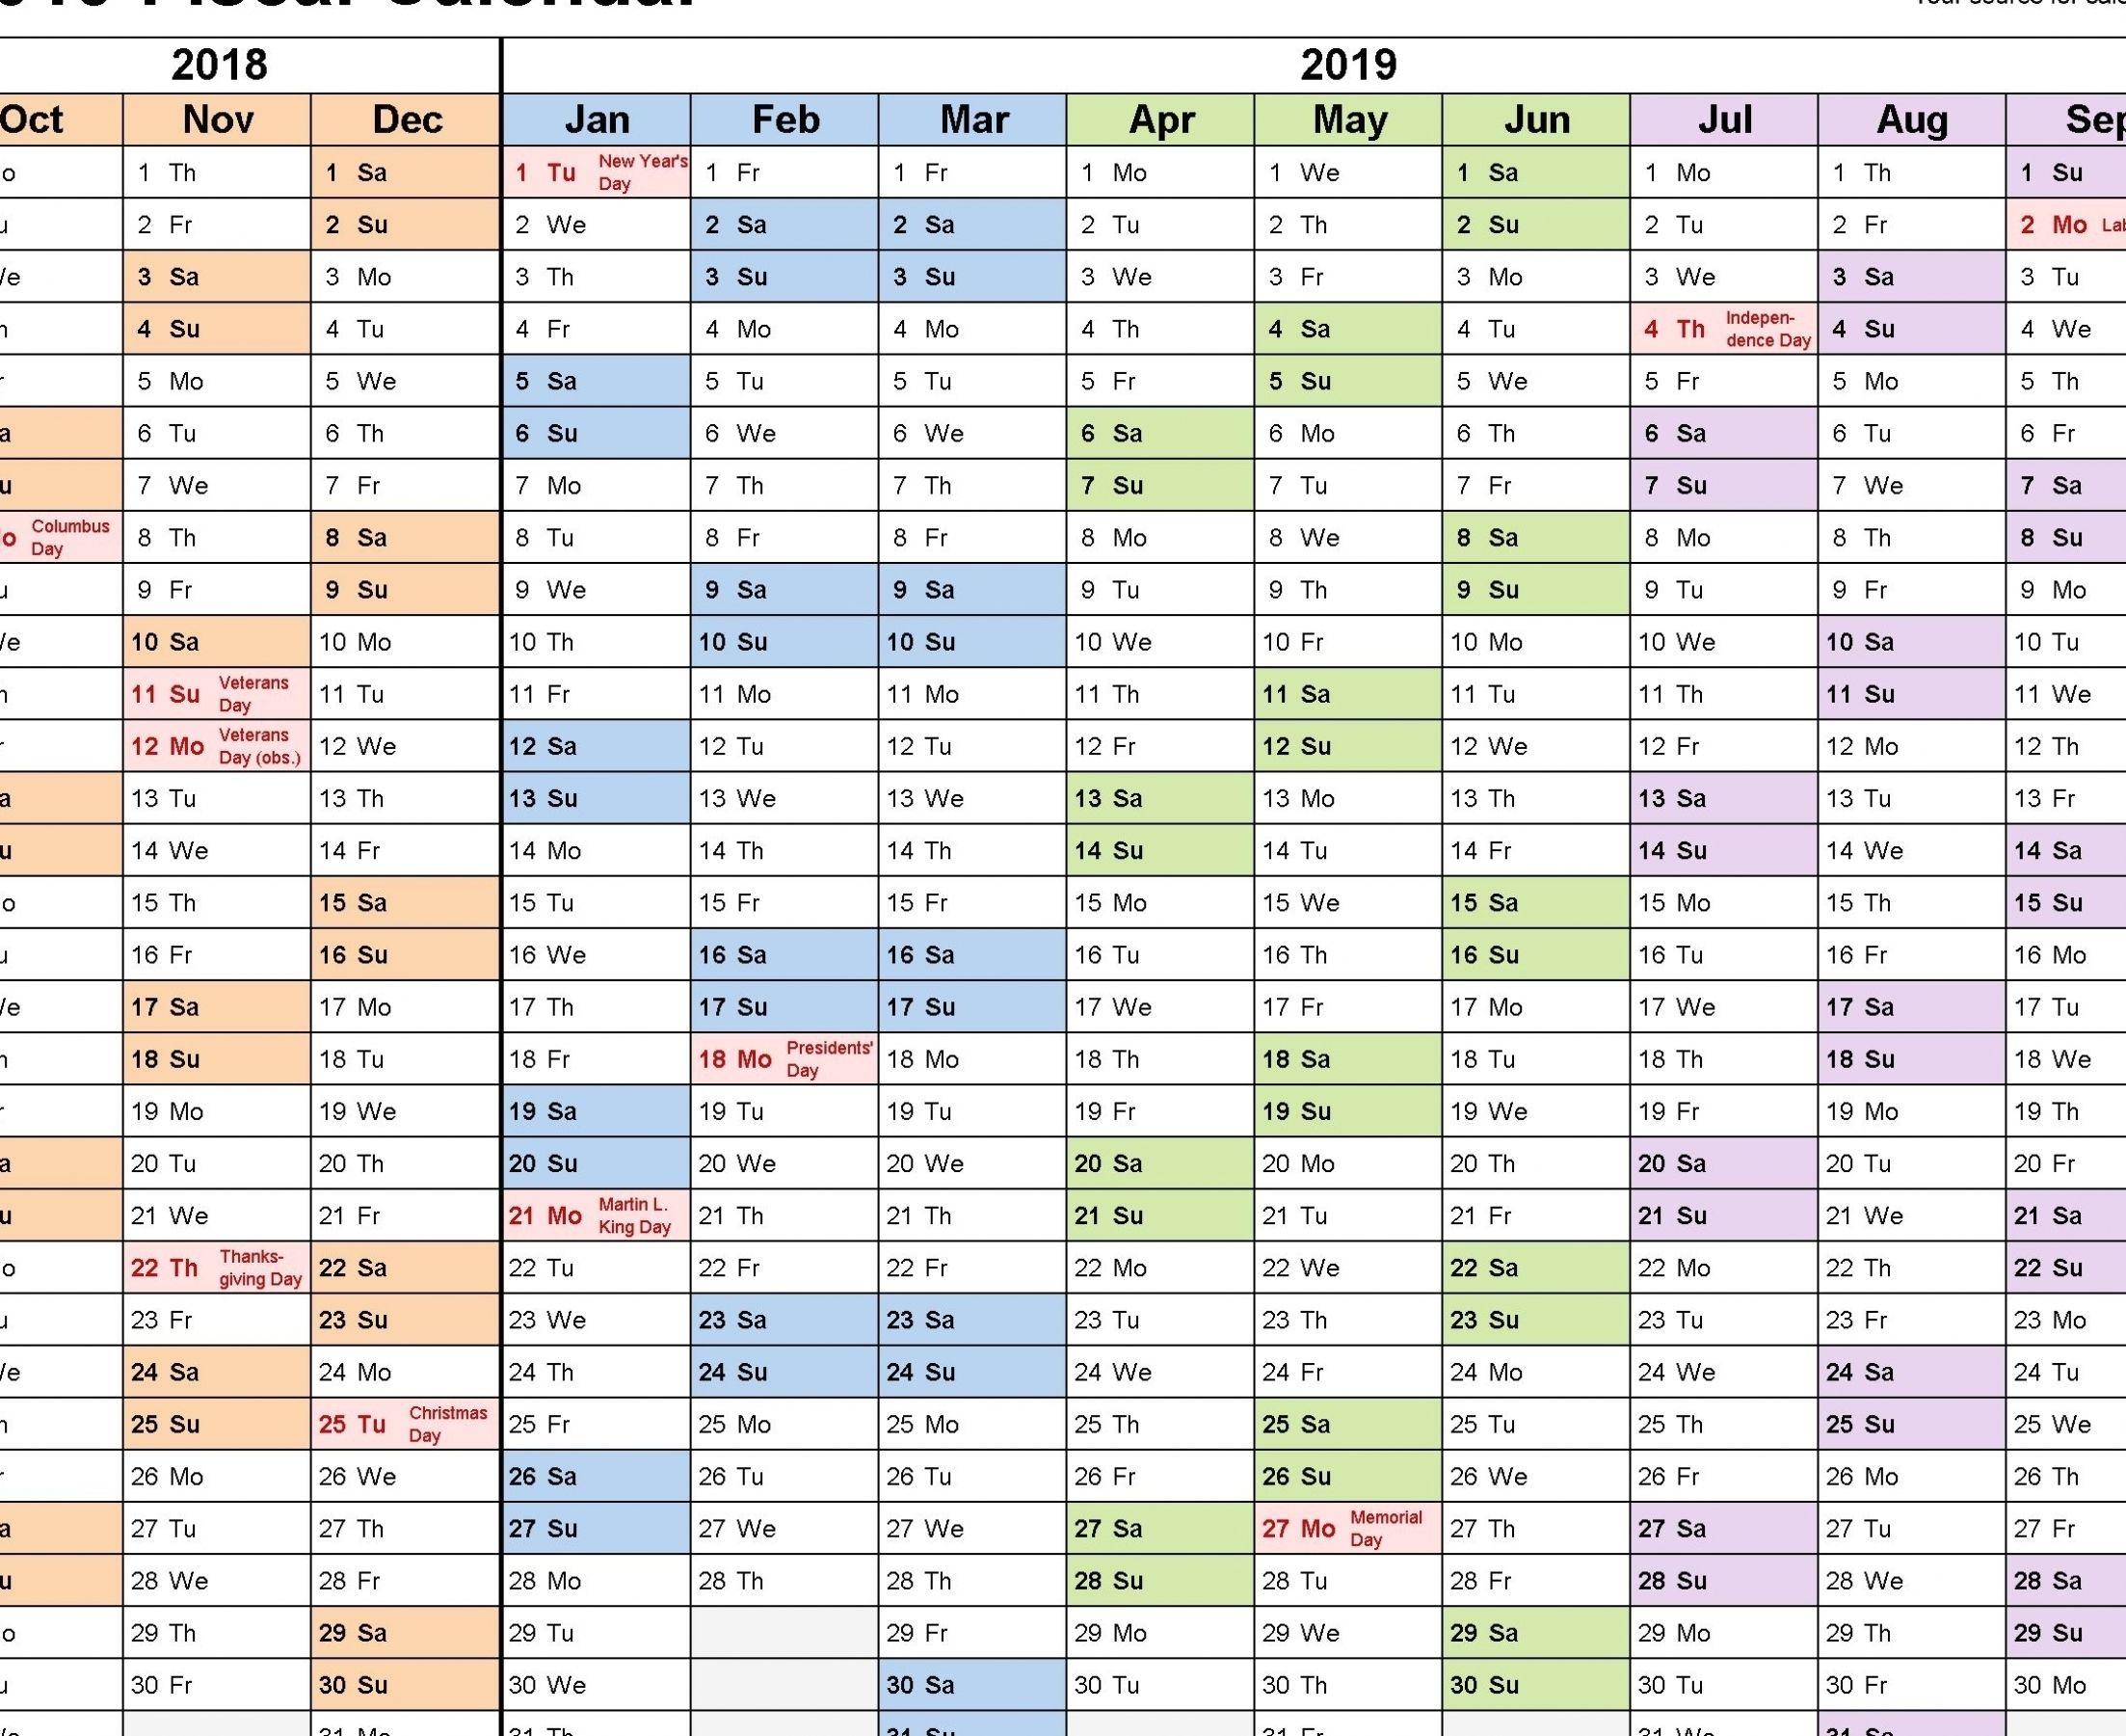 Printable Calendar 2021 January 2021 December 2021 | Etsy In regarding Shift Schedule Jan 2021